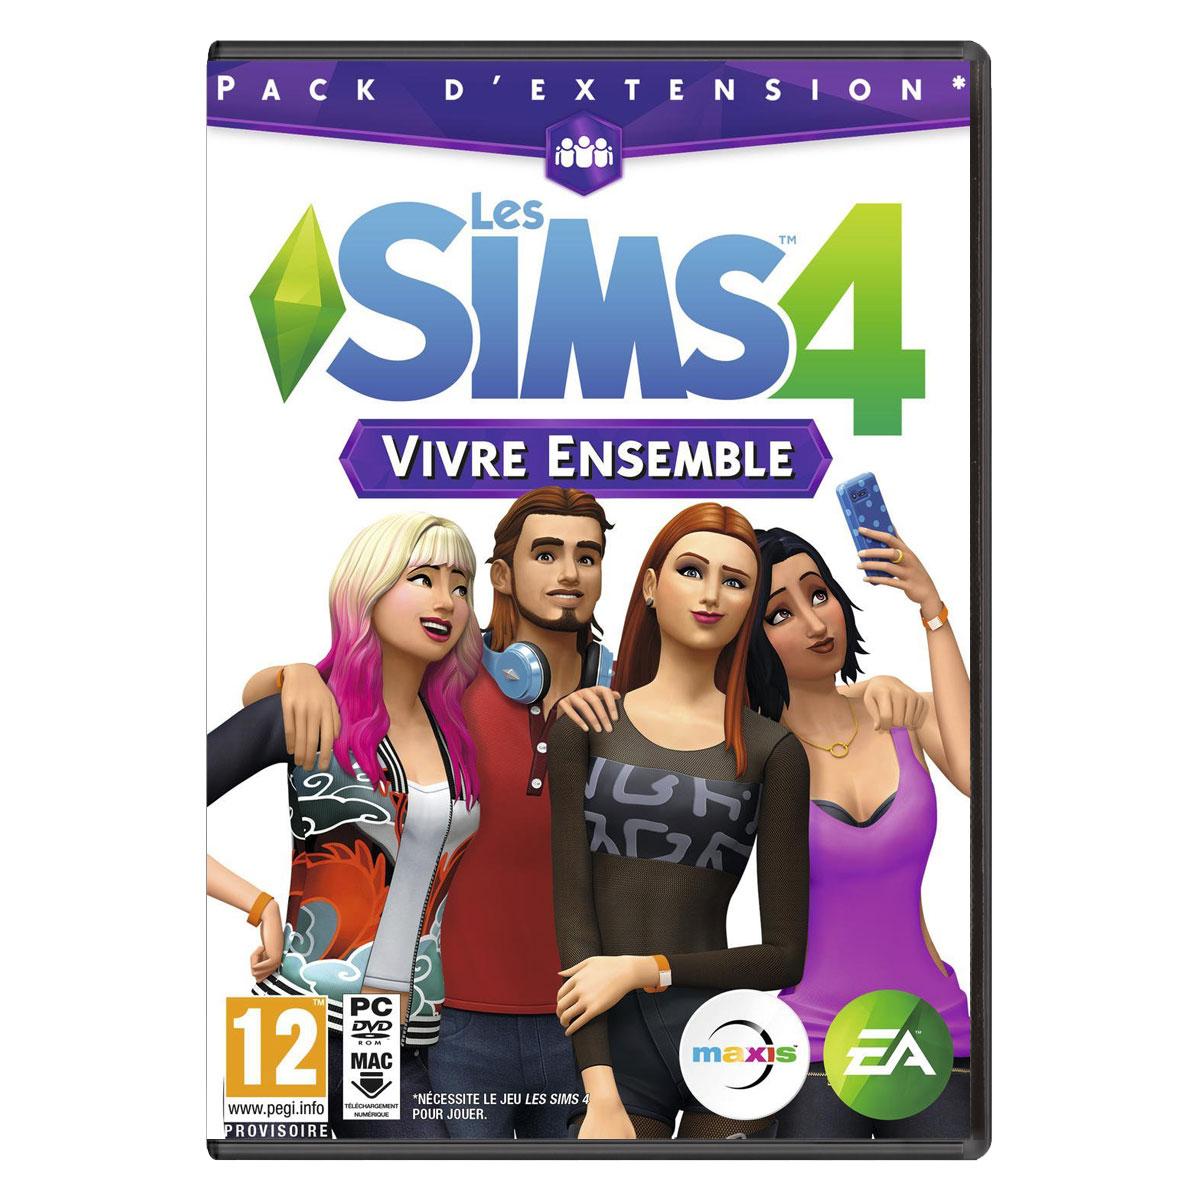 Fanday - <b>Les</b> <b>Sims</b> <b>4</b> <b>Vivre</b> <b>Ensemble</b> - Fezet